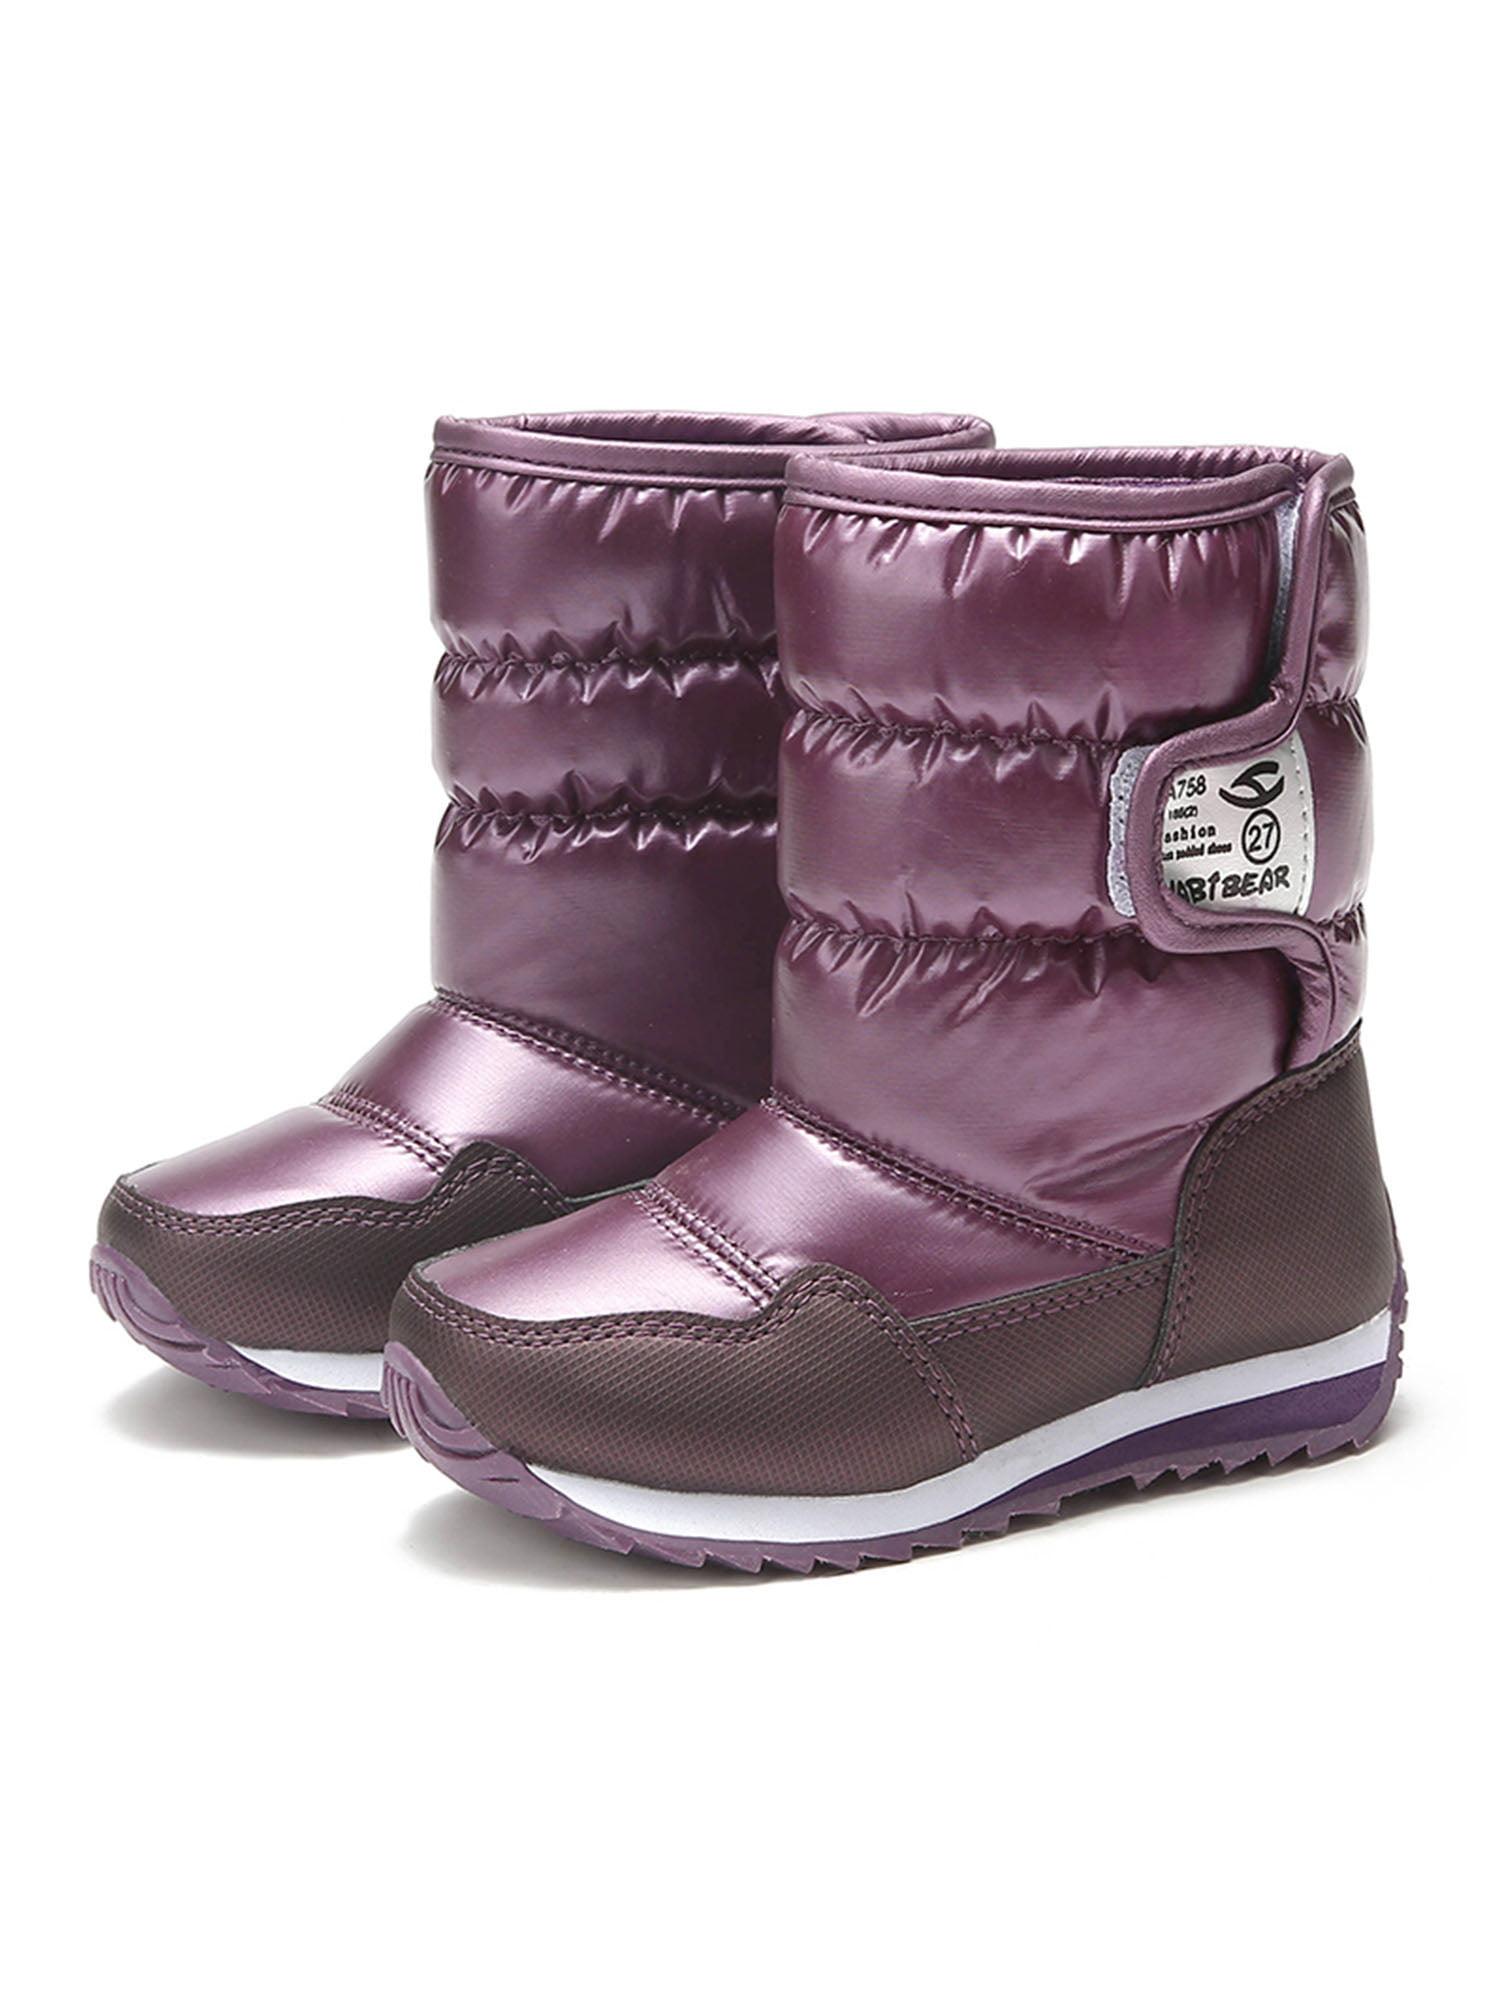 Waterproof Kids Snow Boots Warm Faux Fur Winter Shoes for Boys Girls Outdoor  Anti-slip Children's Winter Boots Gift - Walmart.com - Walmart.com